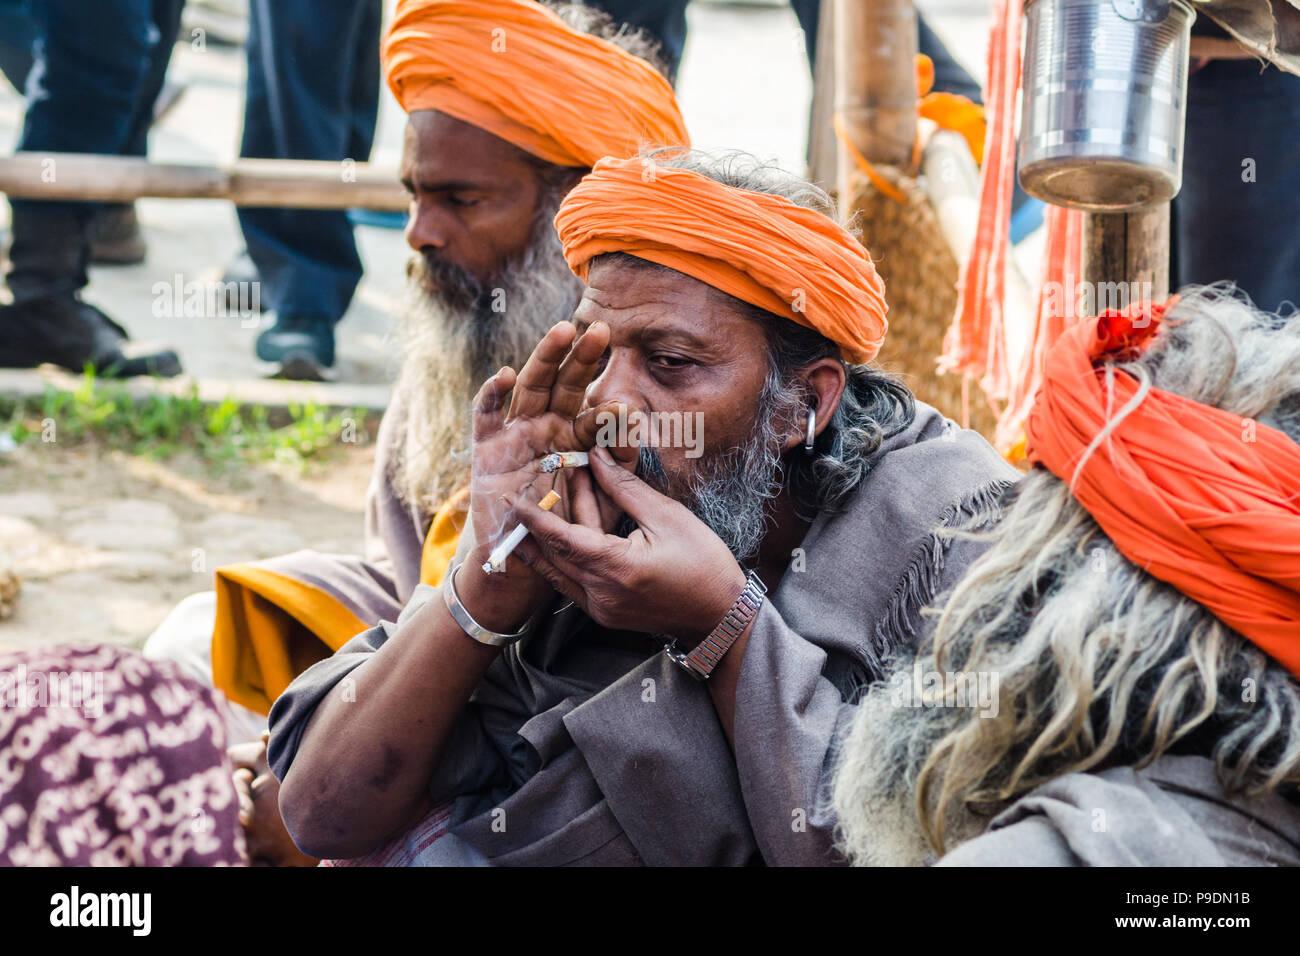 Sadhu smoking weed during Maha Shivaratri, Pashupatinath temple, Nepal Stock Photo